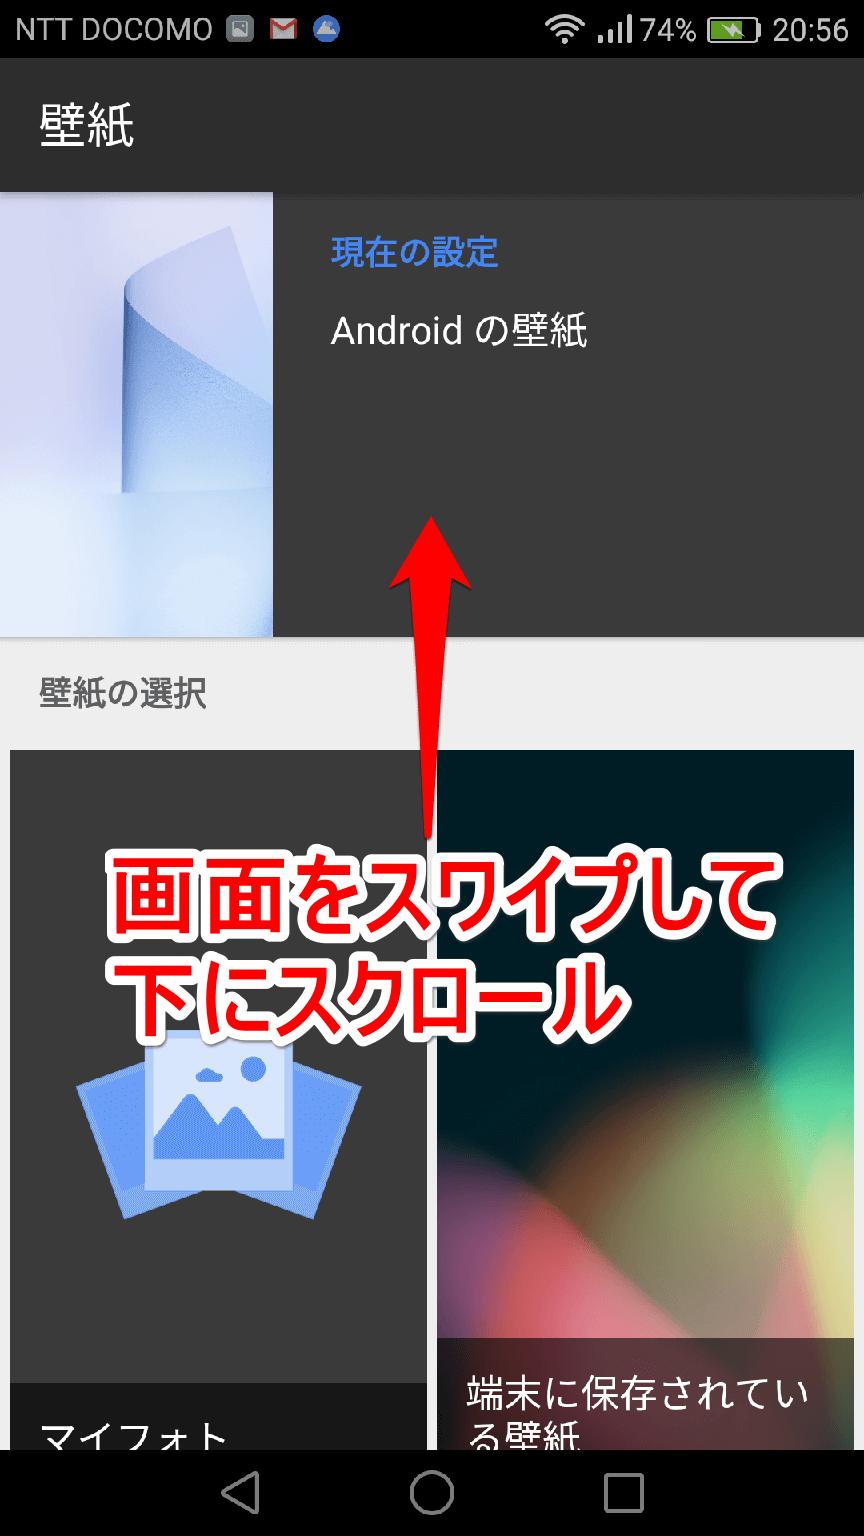 Android新アプリ Google公式 壁紙 アプリが公開 美しい写真を毎日